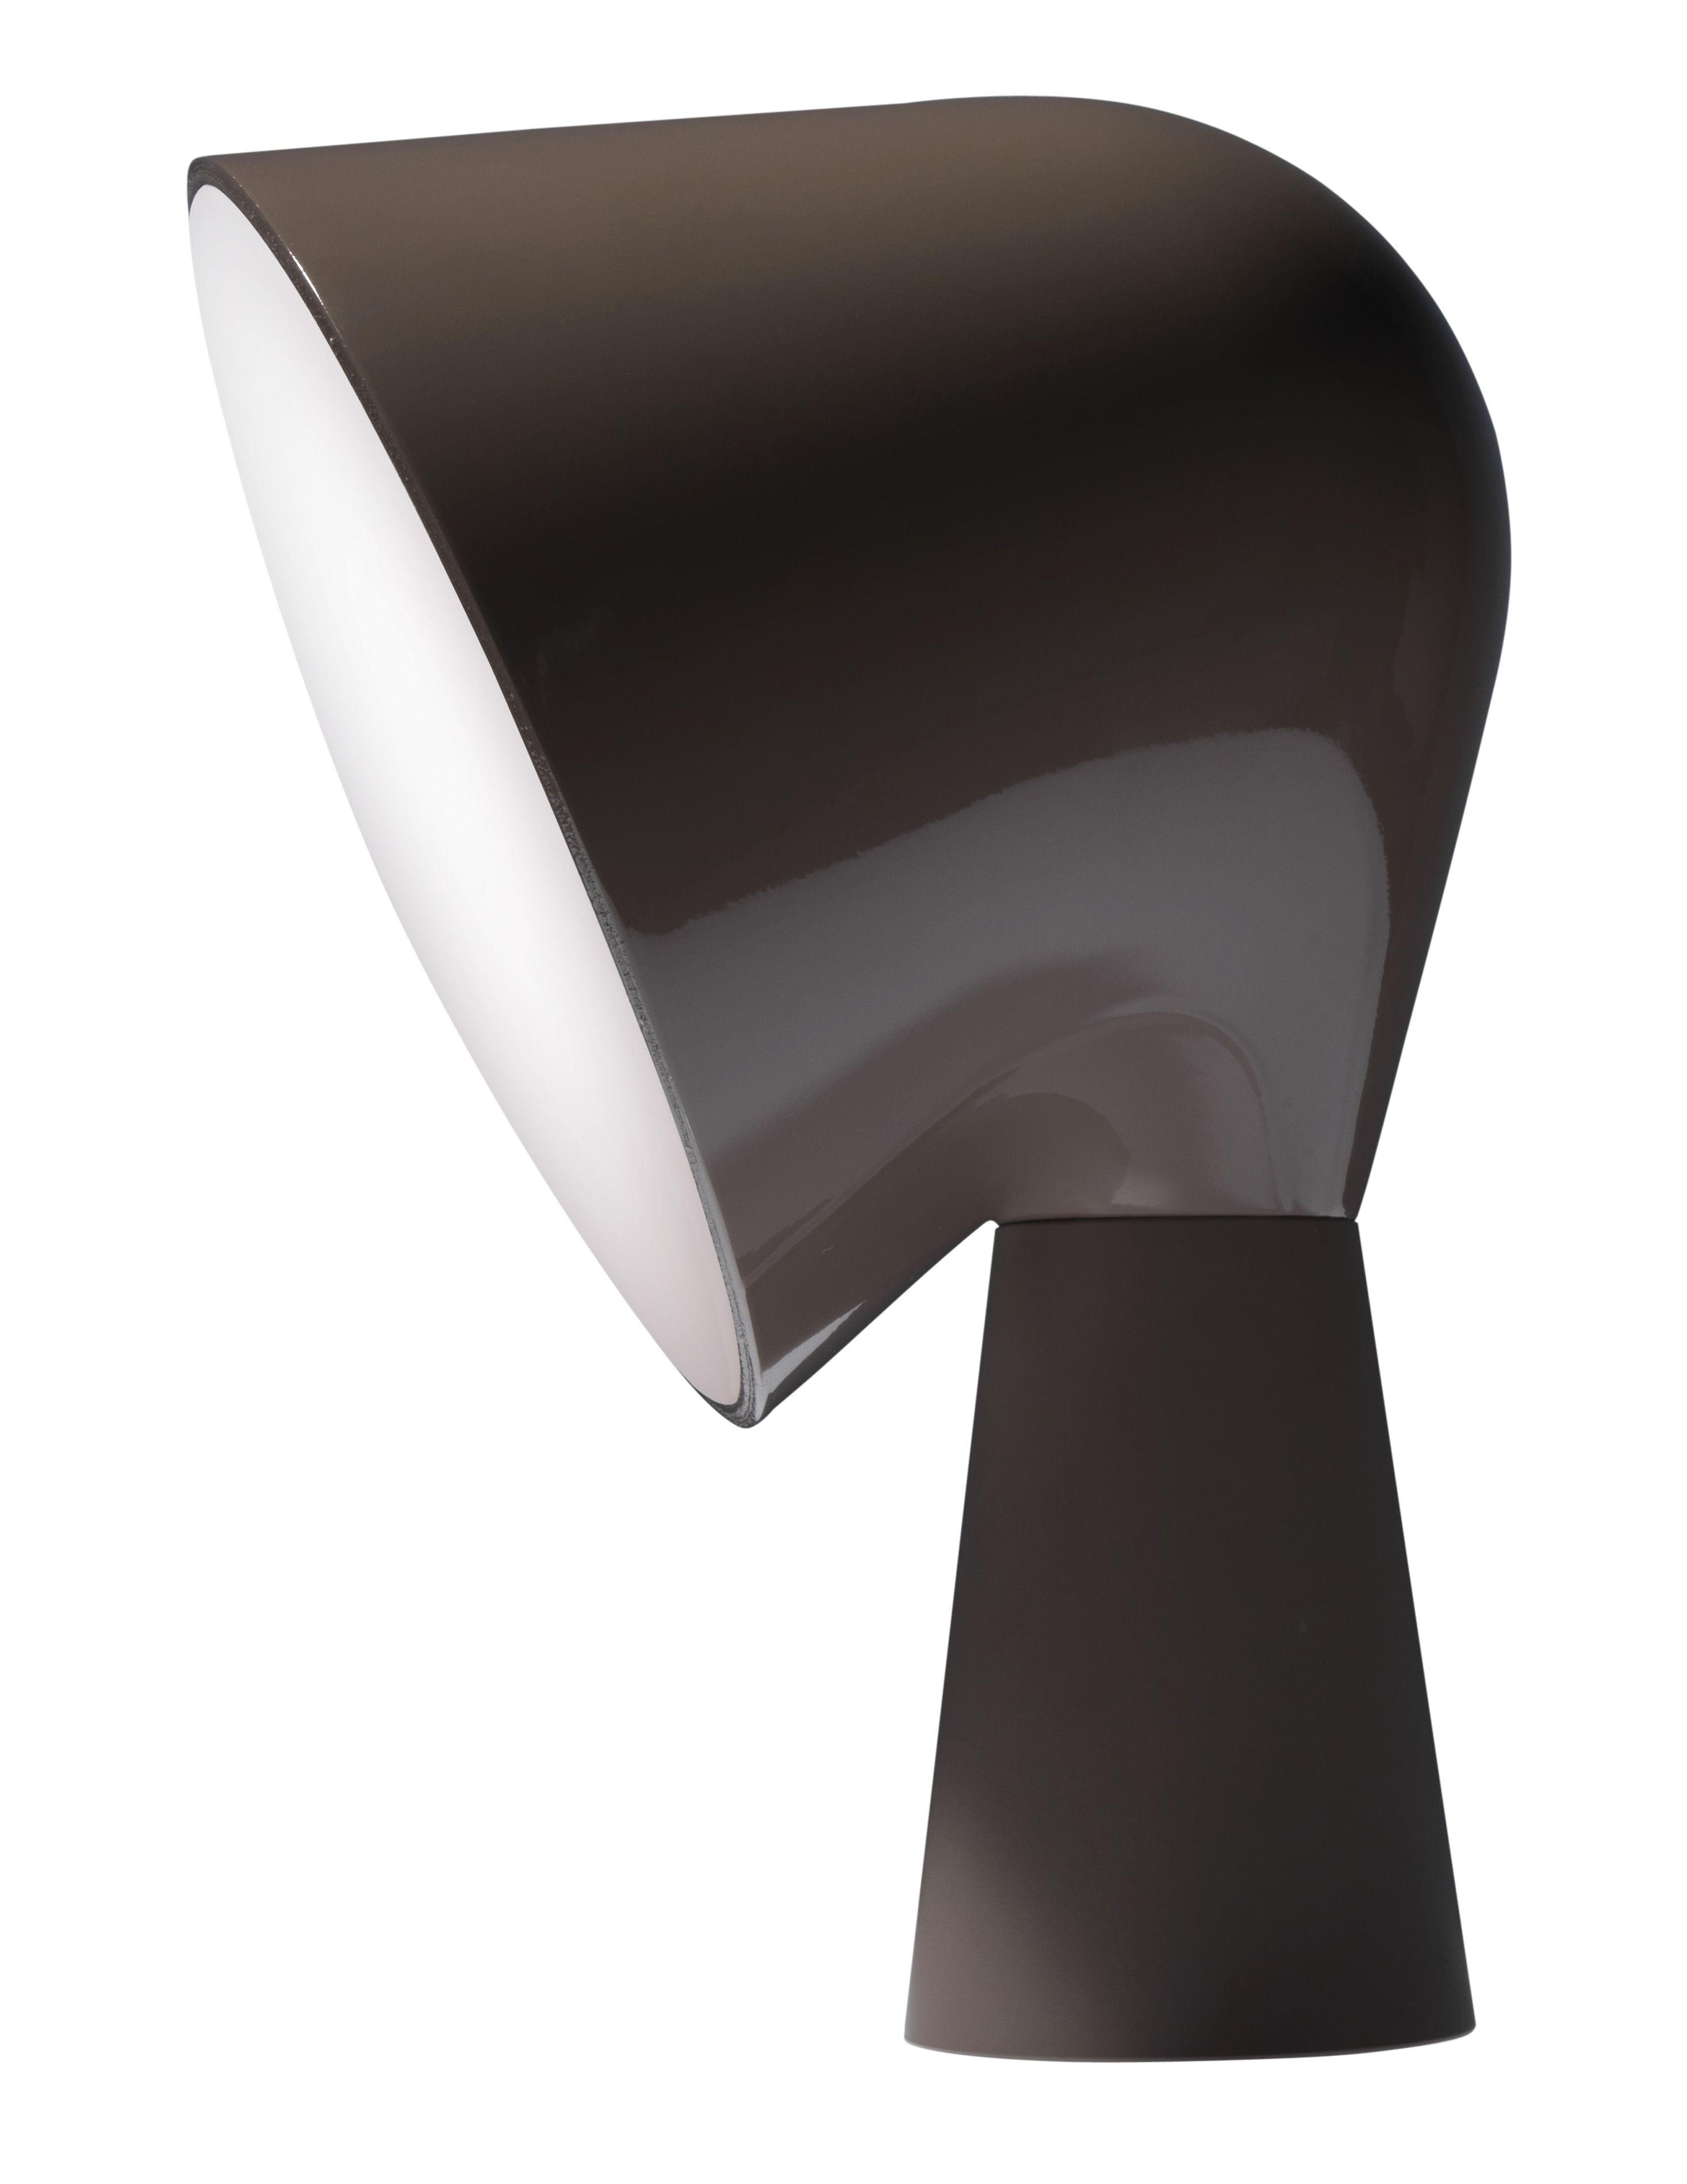 binic tischleuchte grau by foscarini made in design. Black Bedroom Furniture Sets. Home Design Ideas